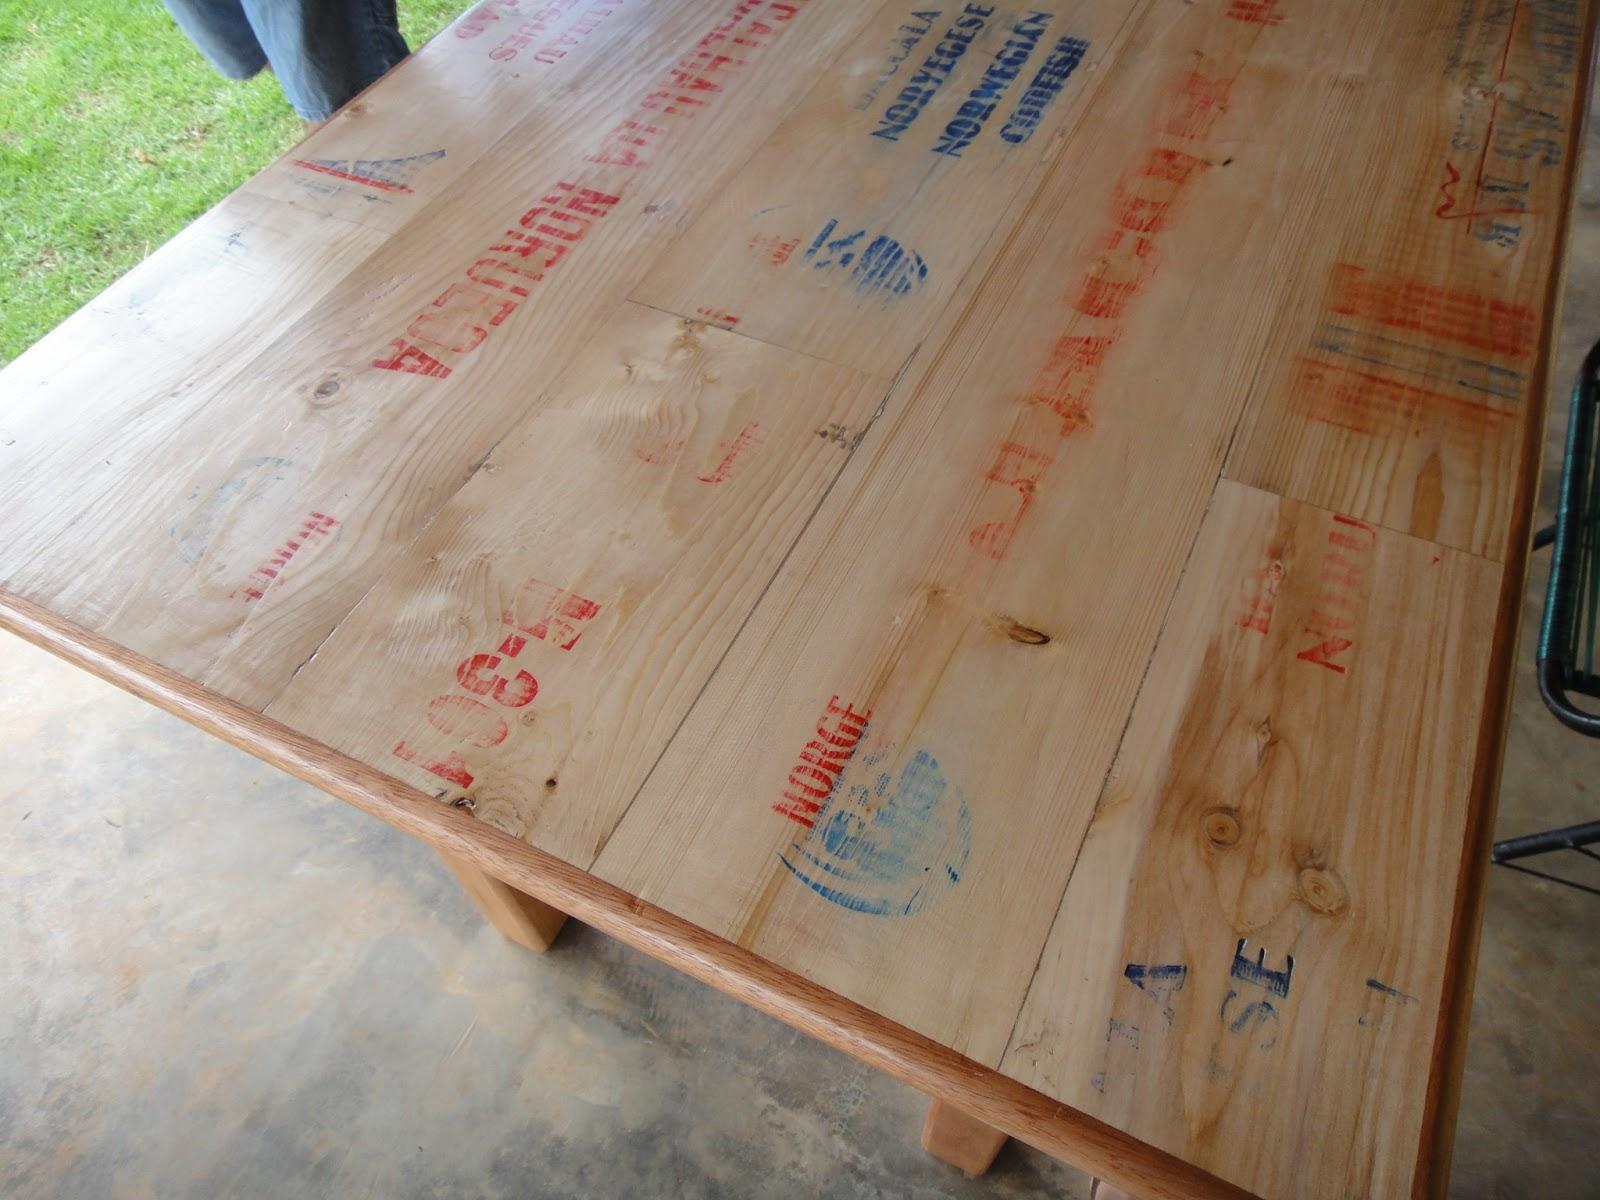 Caixas de bacalhau da Noruega sobre a mesa #70472C 1600x1200